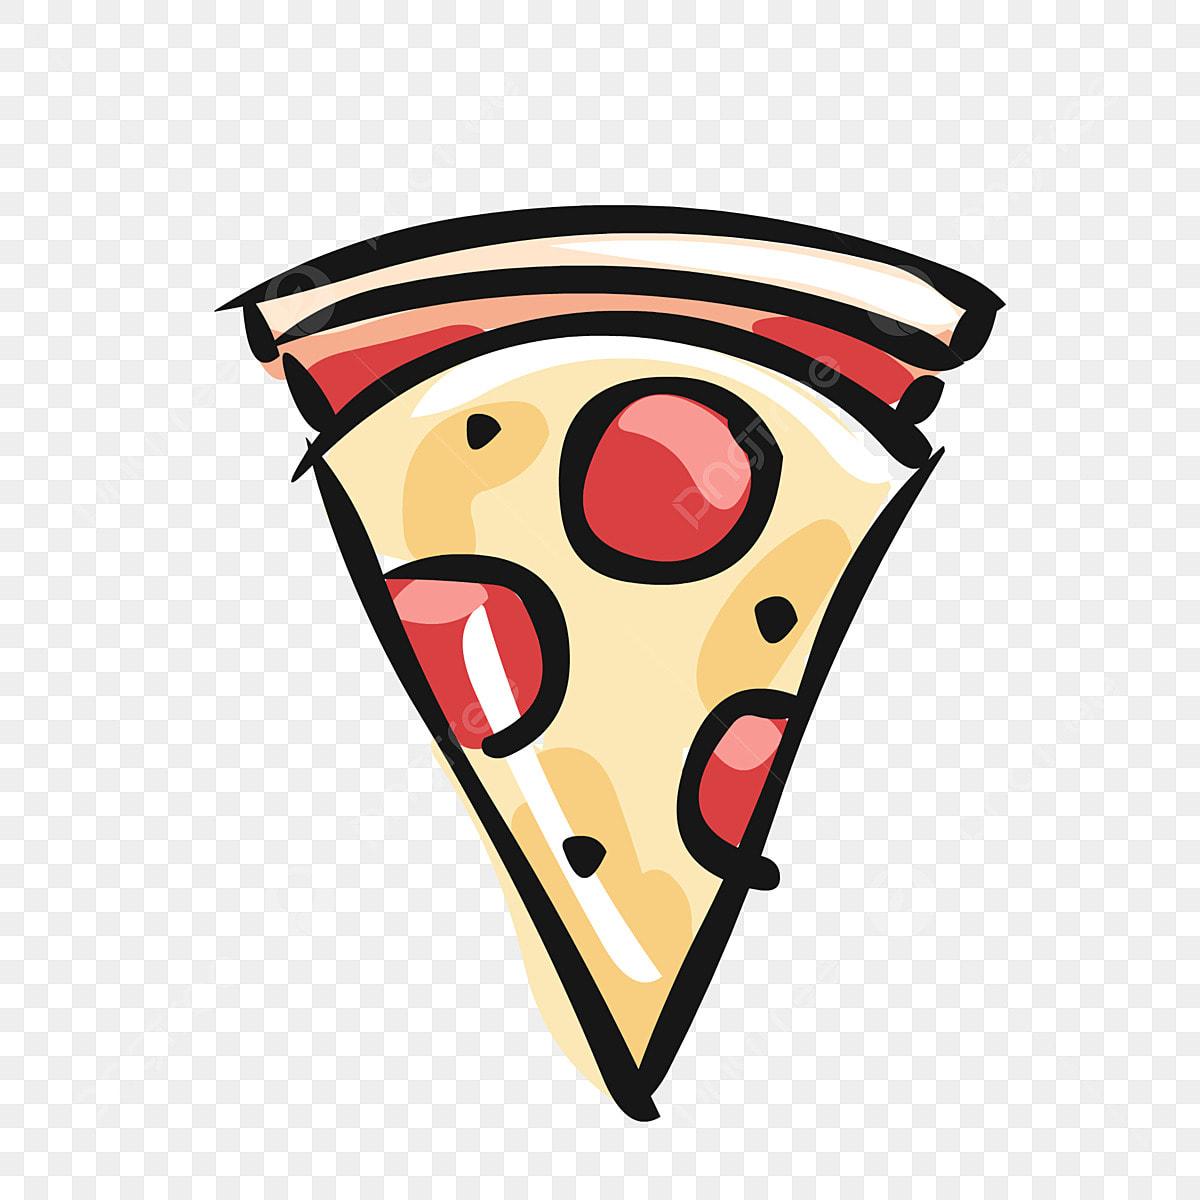 Unsur Makanan Tangan Disediakan Pizza Kartun Comel Elemen Makanan